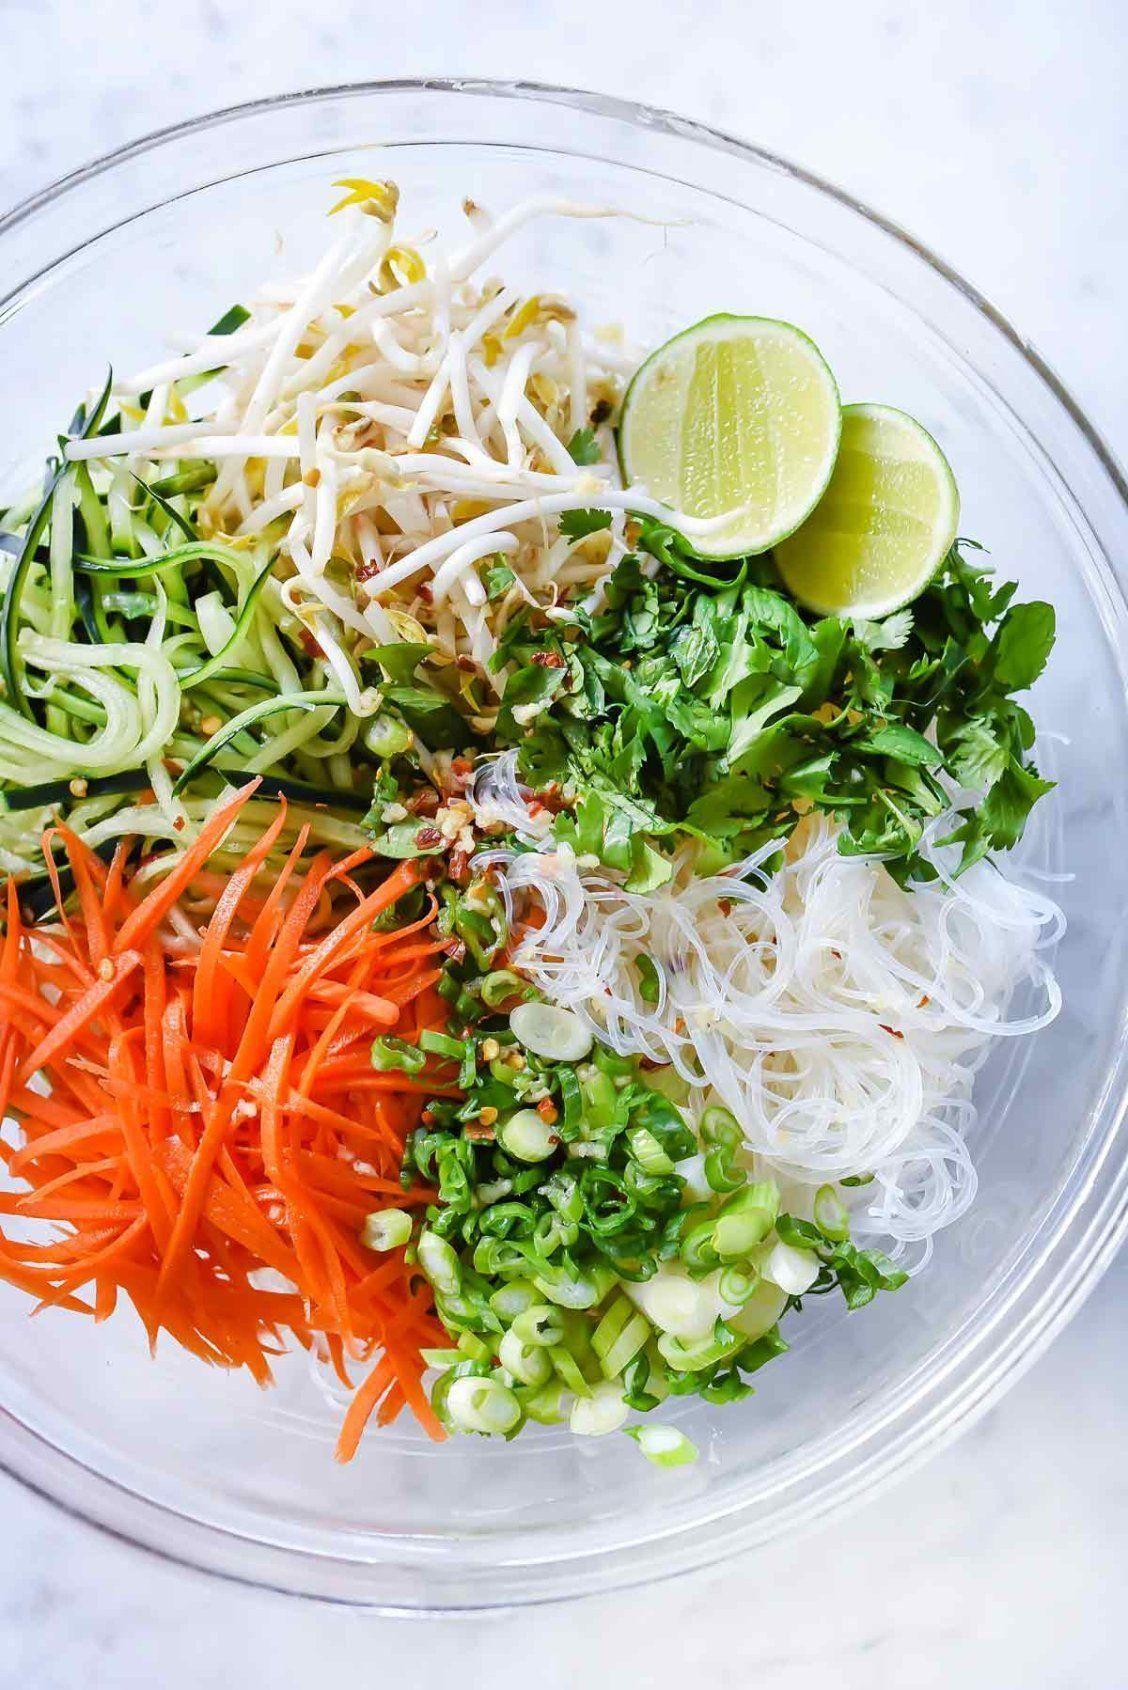 Fresh And Easy Vietnamese Noodle Salad Foodiecrush Com African Food Vegetaria Foodvege In 2020 Vietnamese Noodle Salad Noodle Salad Recipes Vietnamese Noodles